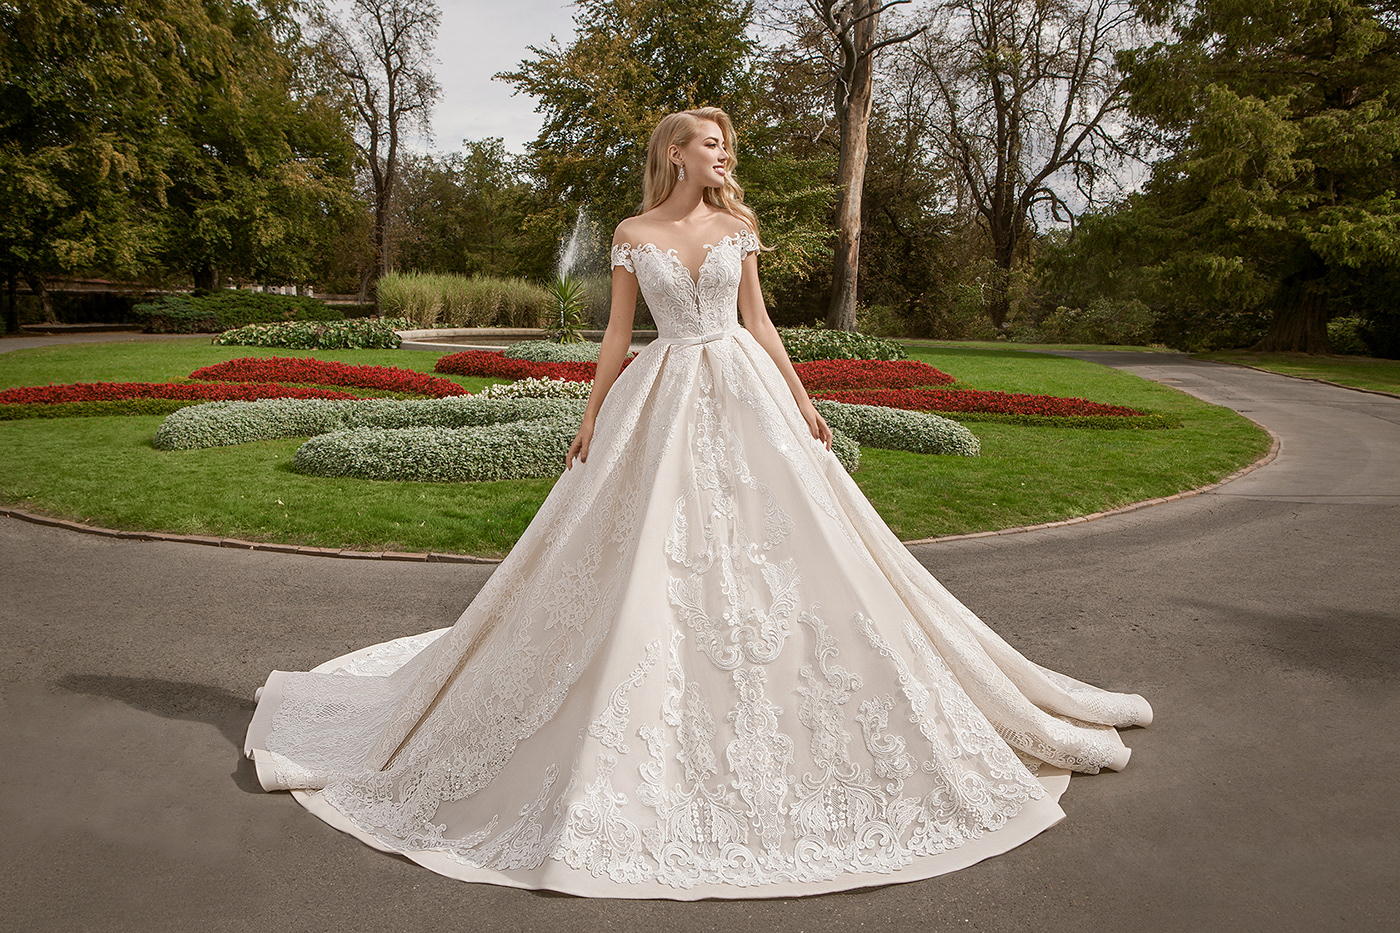 The Princess Bride -